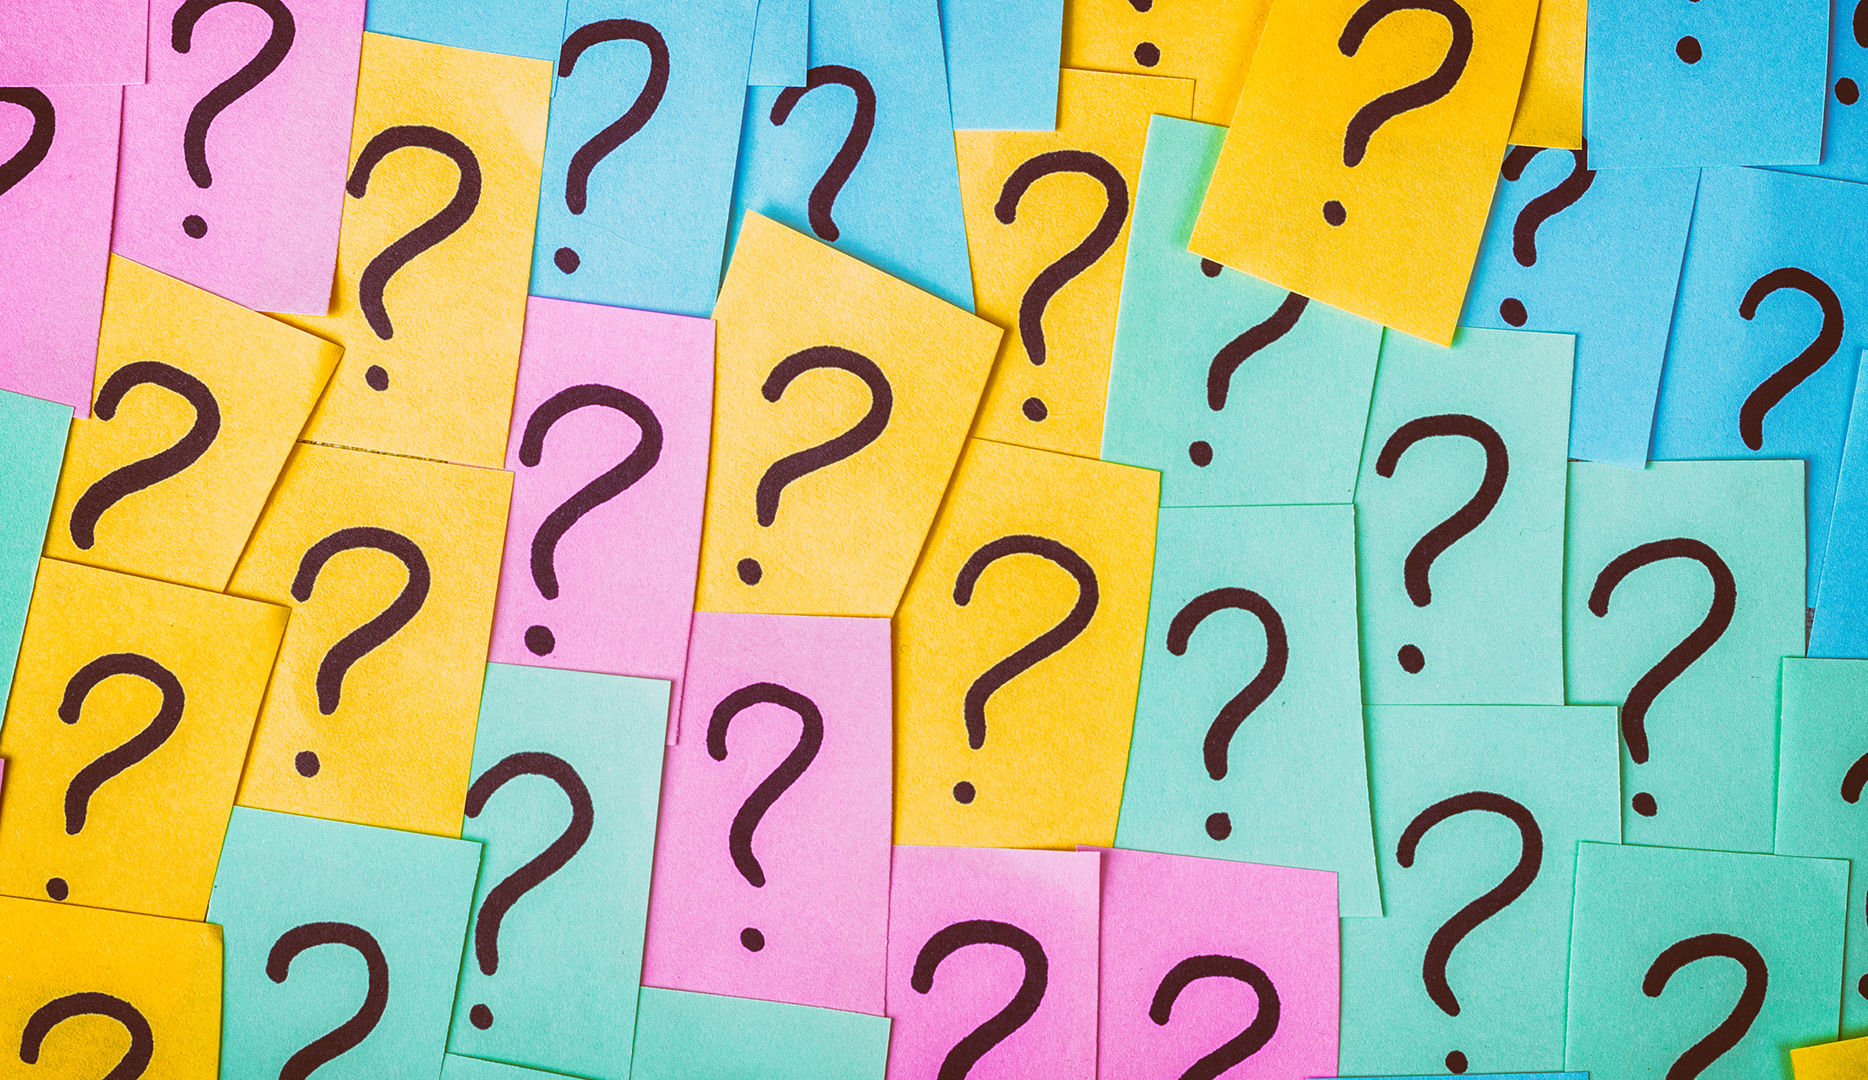 Effective Crisis Communication Tips for Client Services Teams